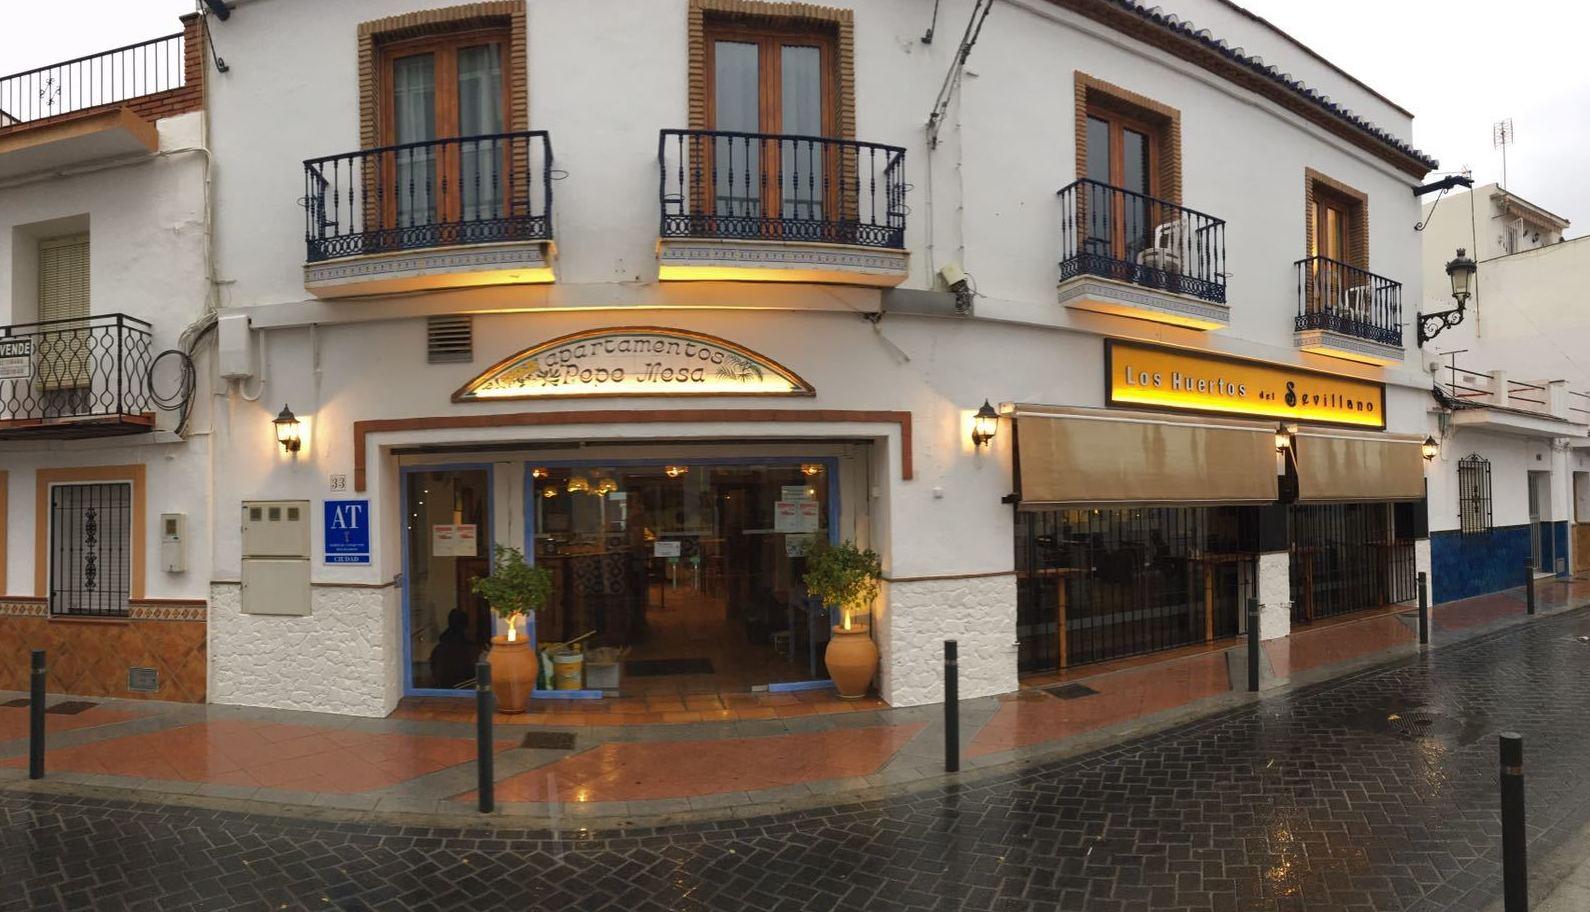 Foto 28 de Cocina andaluza en Nerja | Restaurante Sevillano